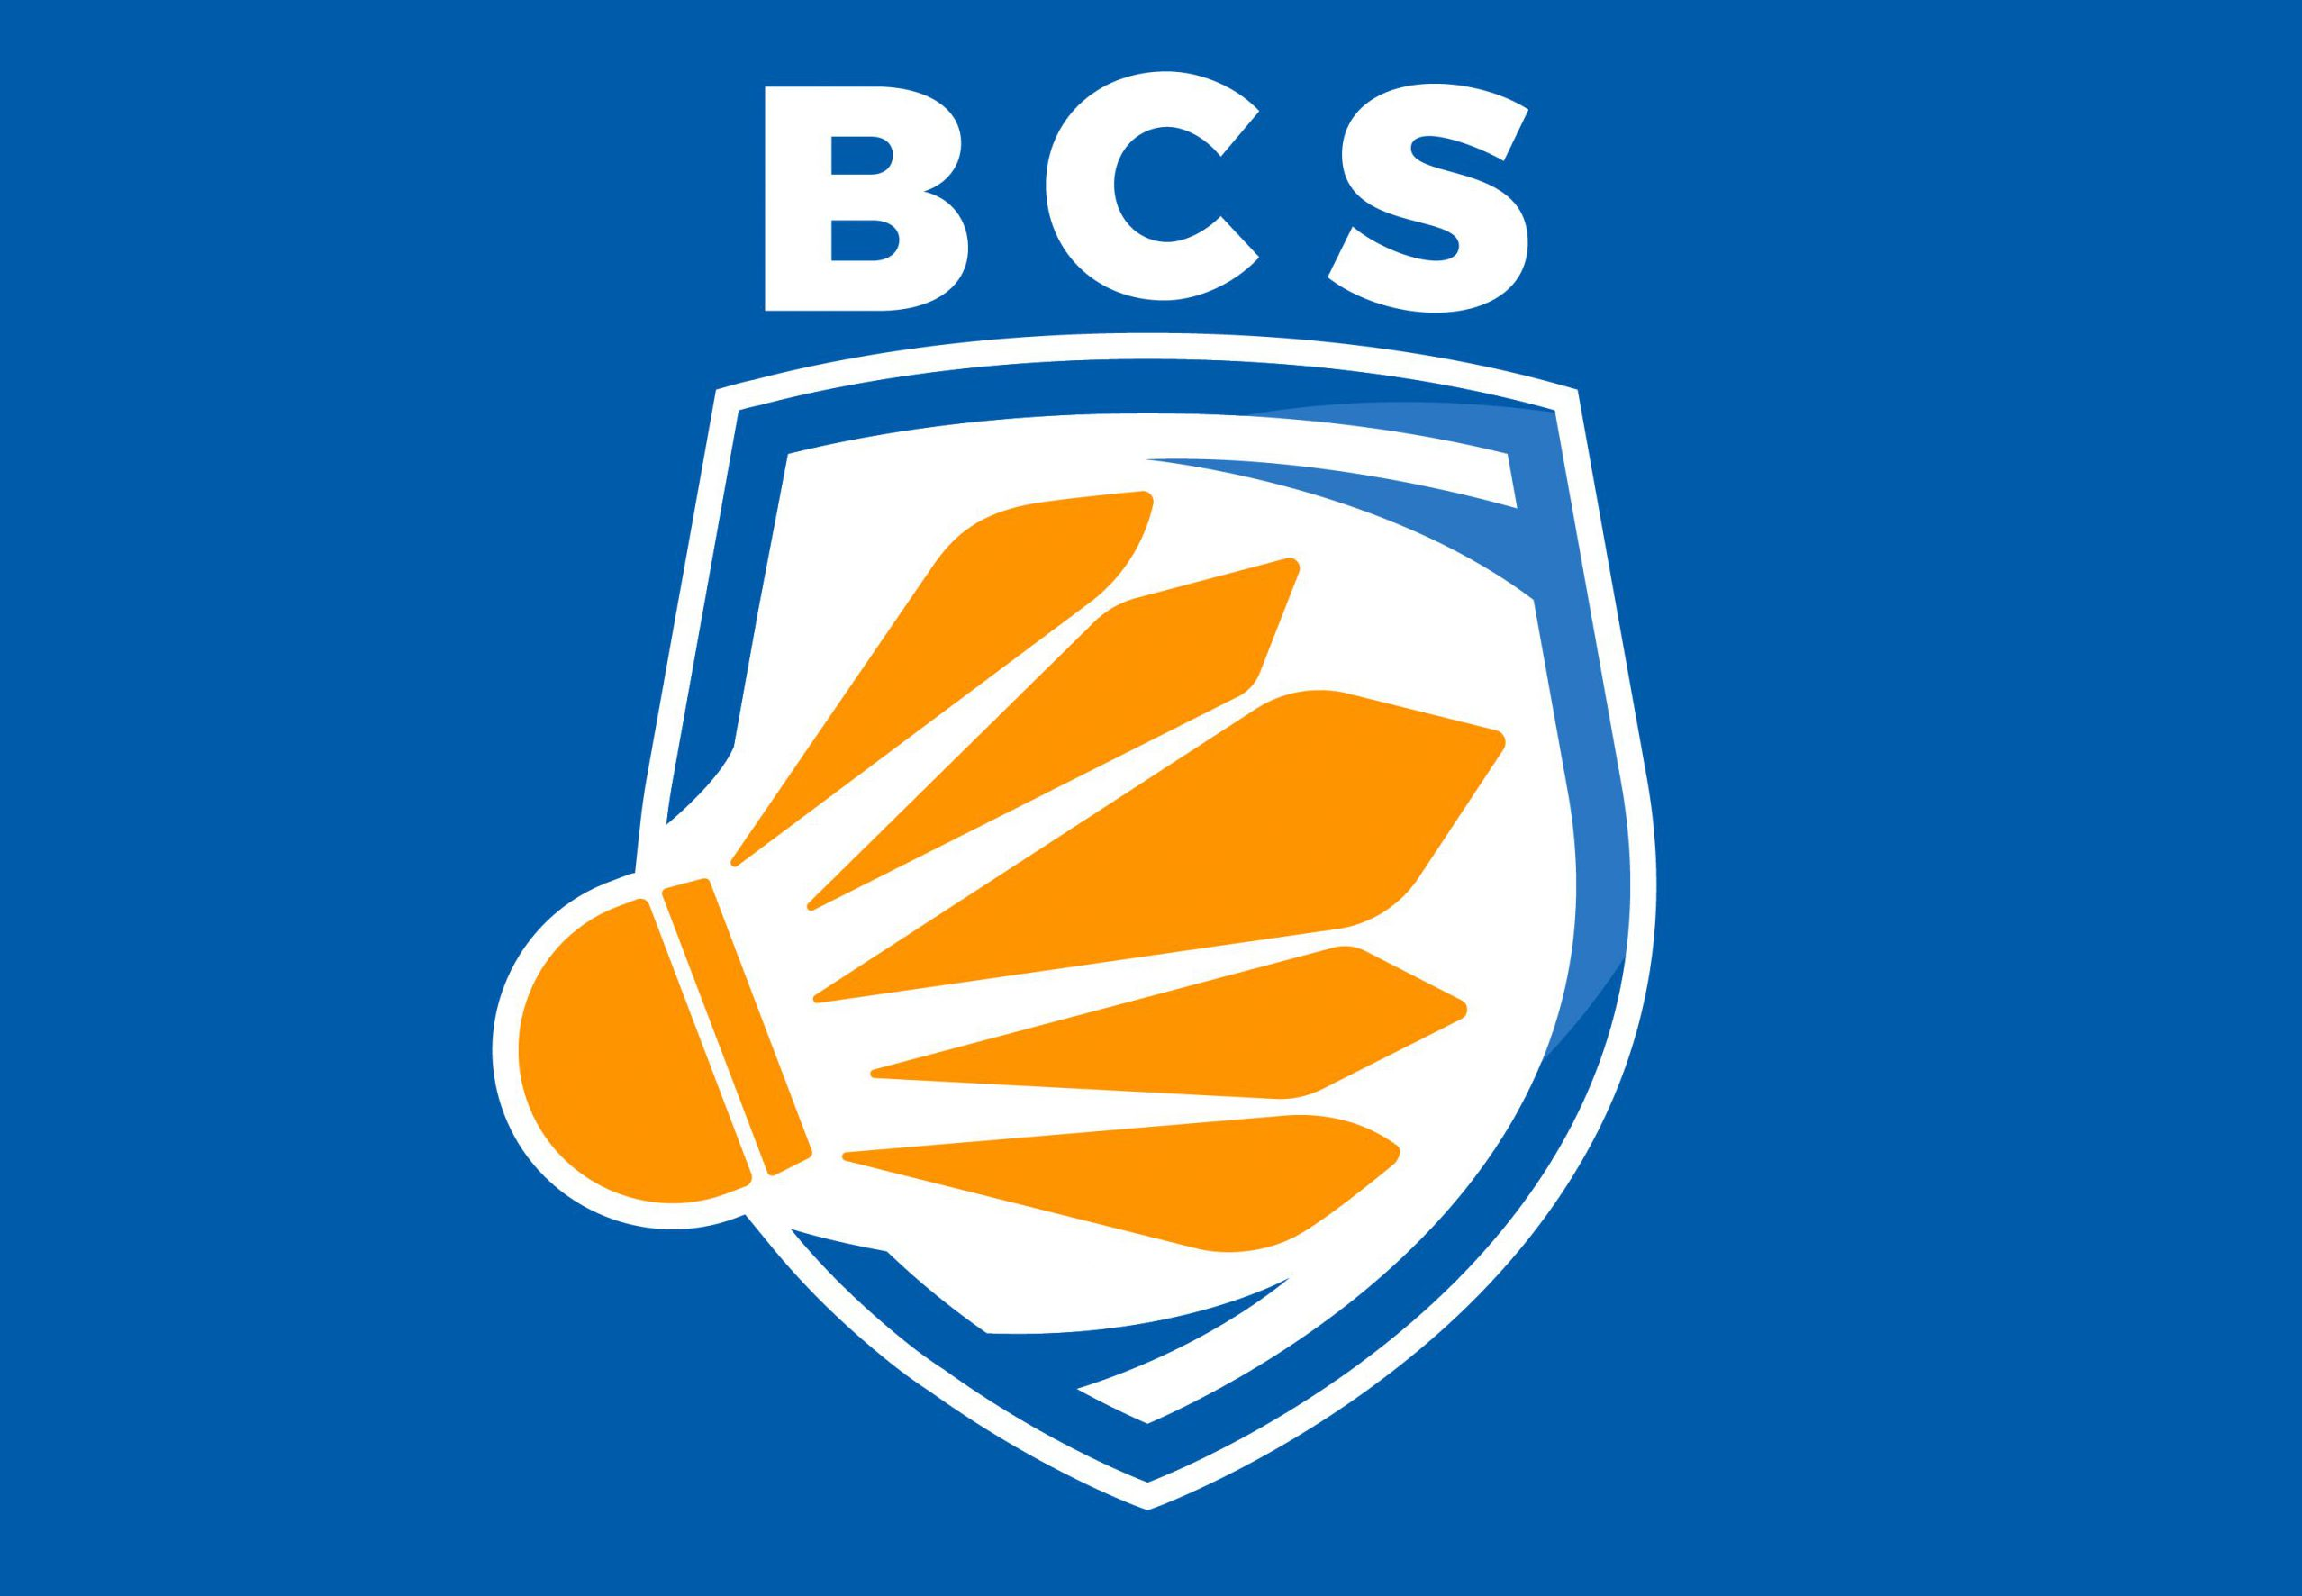 Badmintonclub Schoonhoven